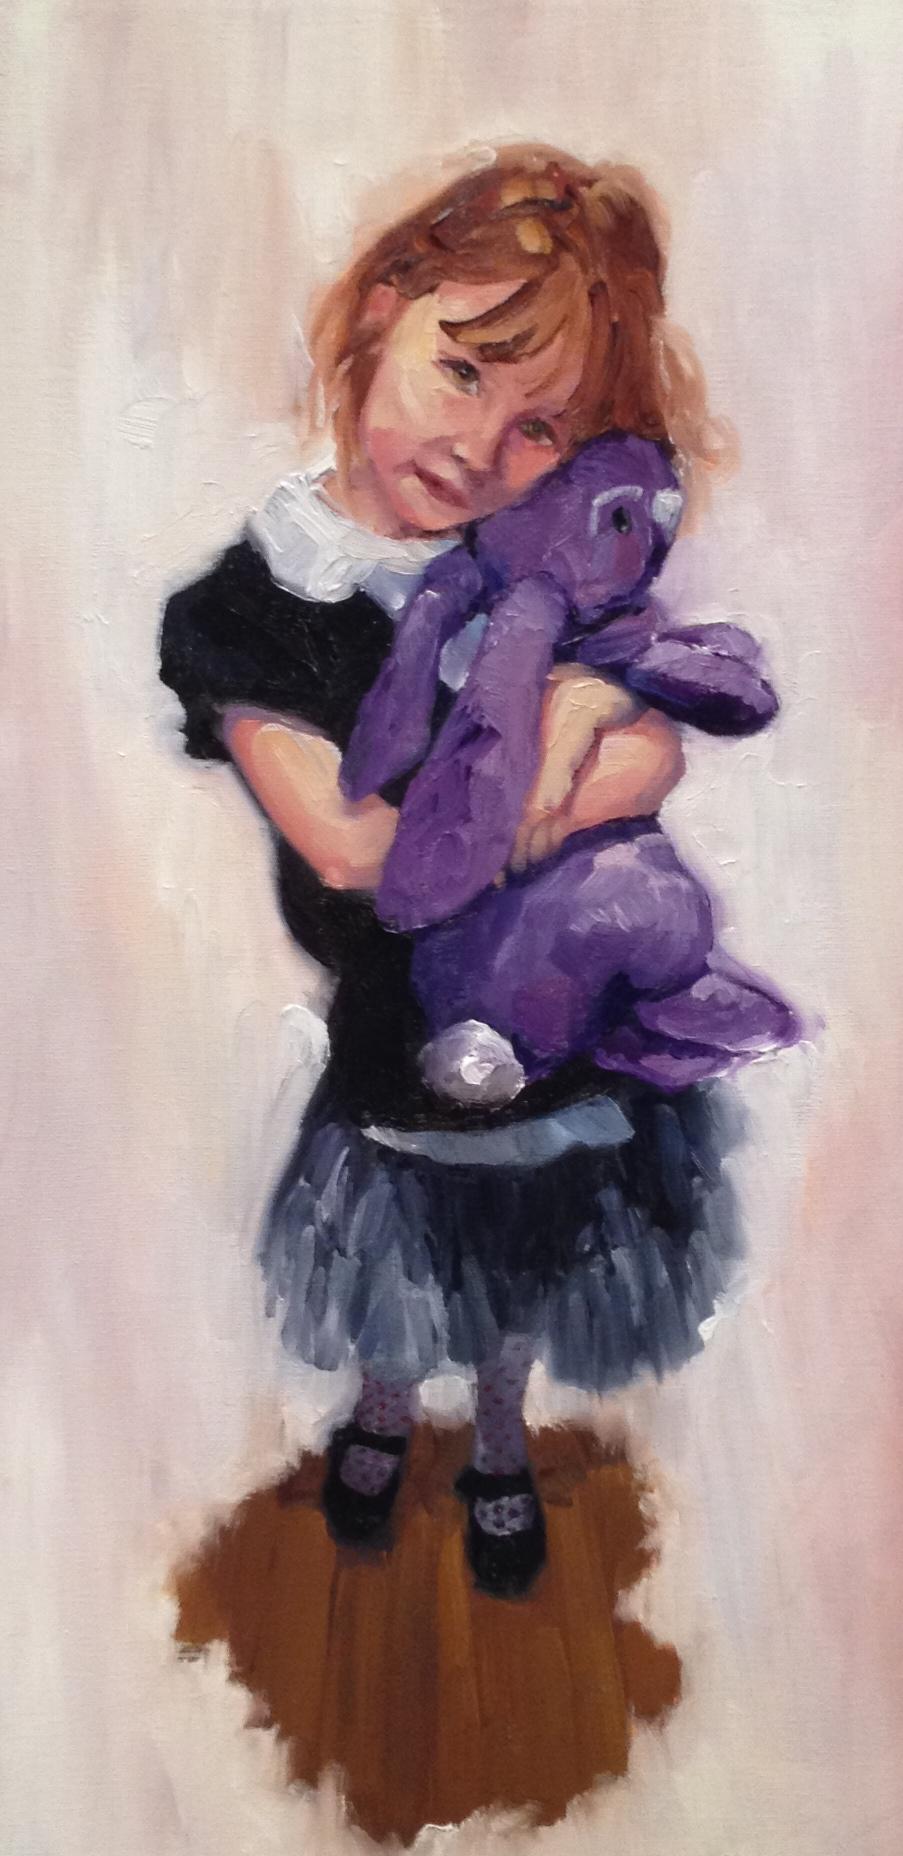 9_Bunny Hugs.jpg